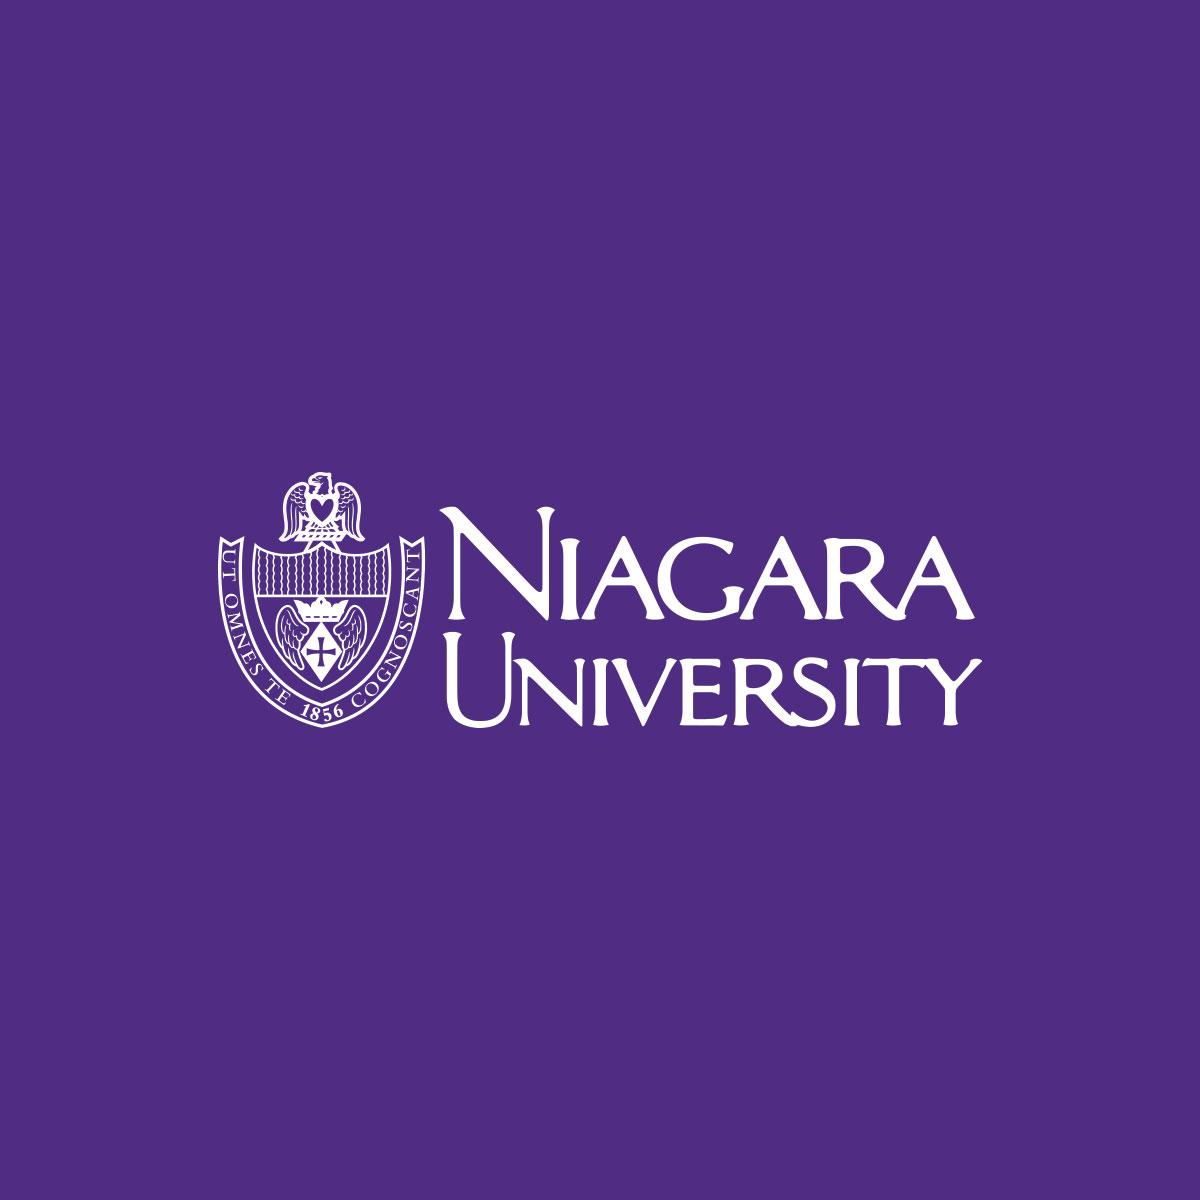 Niagara University.